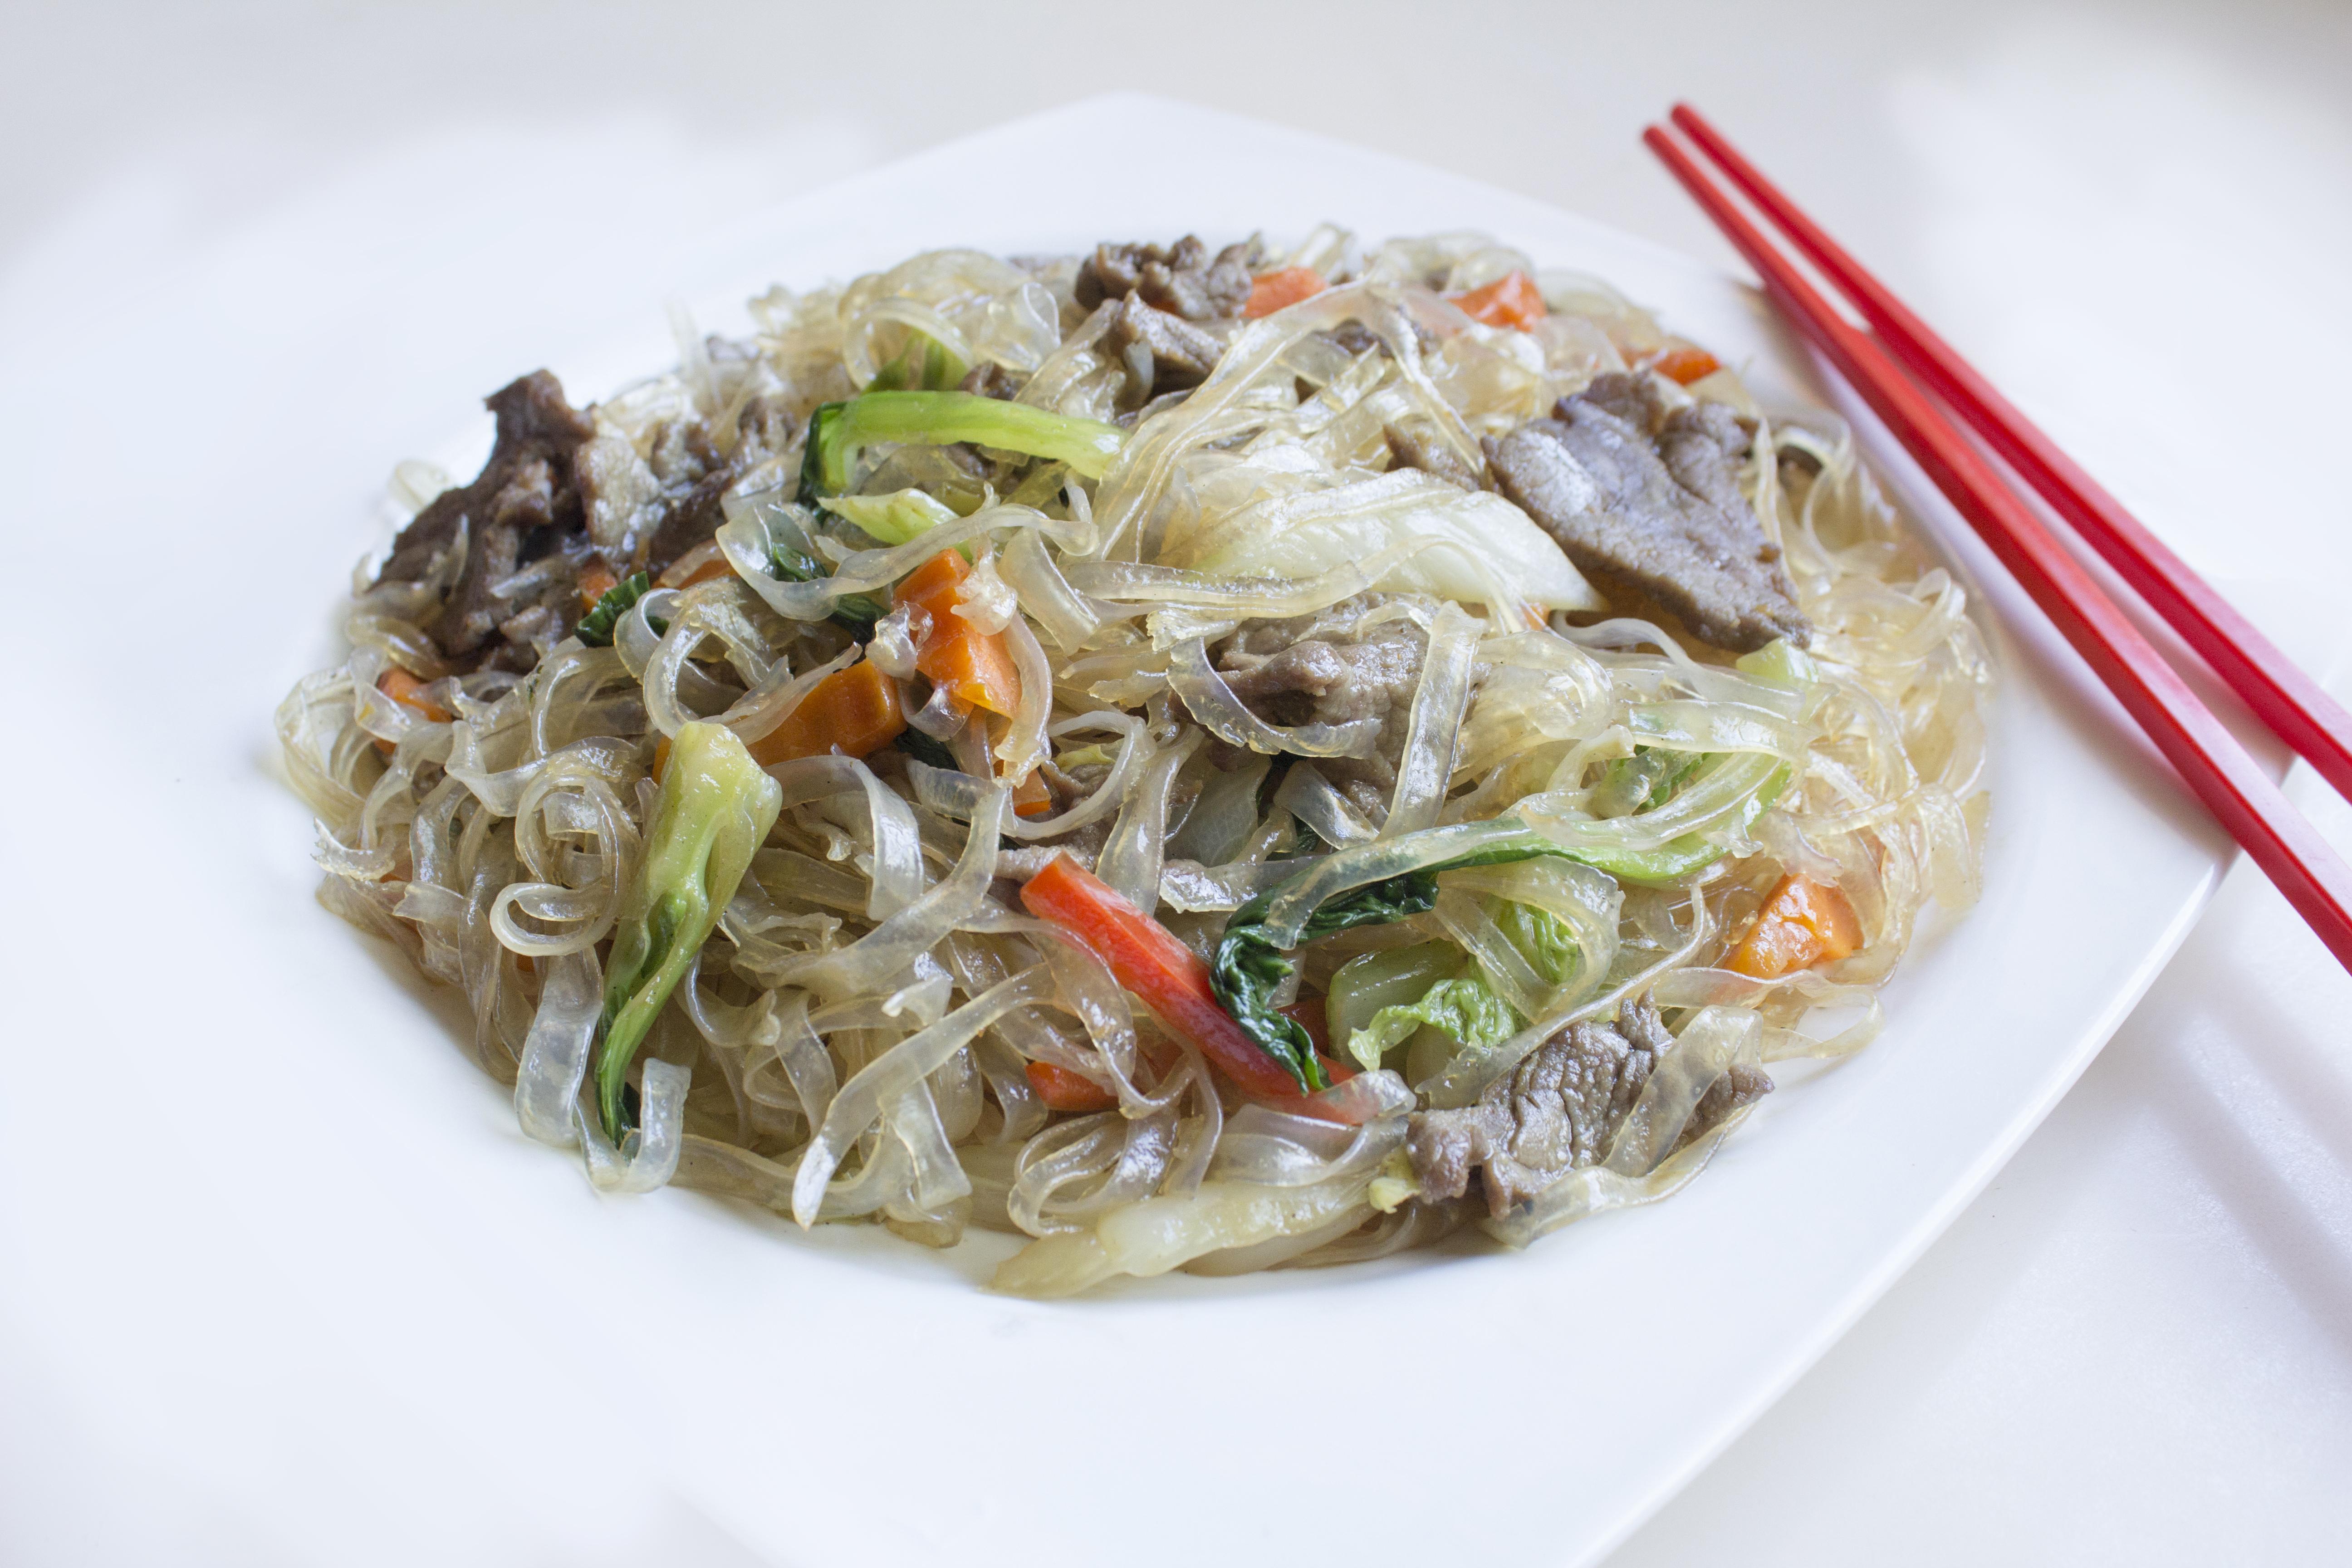 PastaFrijolesVerdes-shanghao2